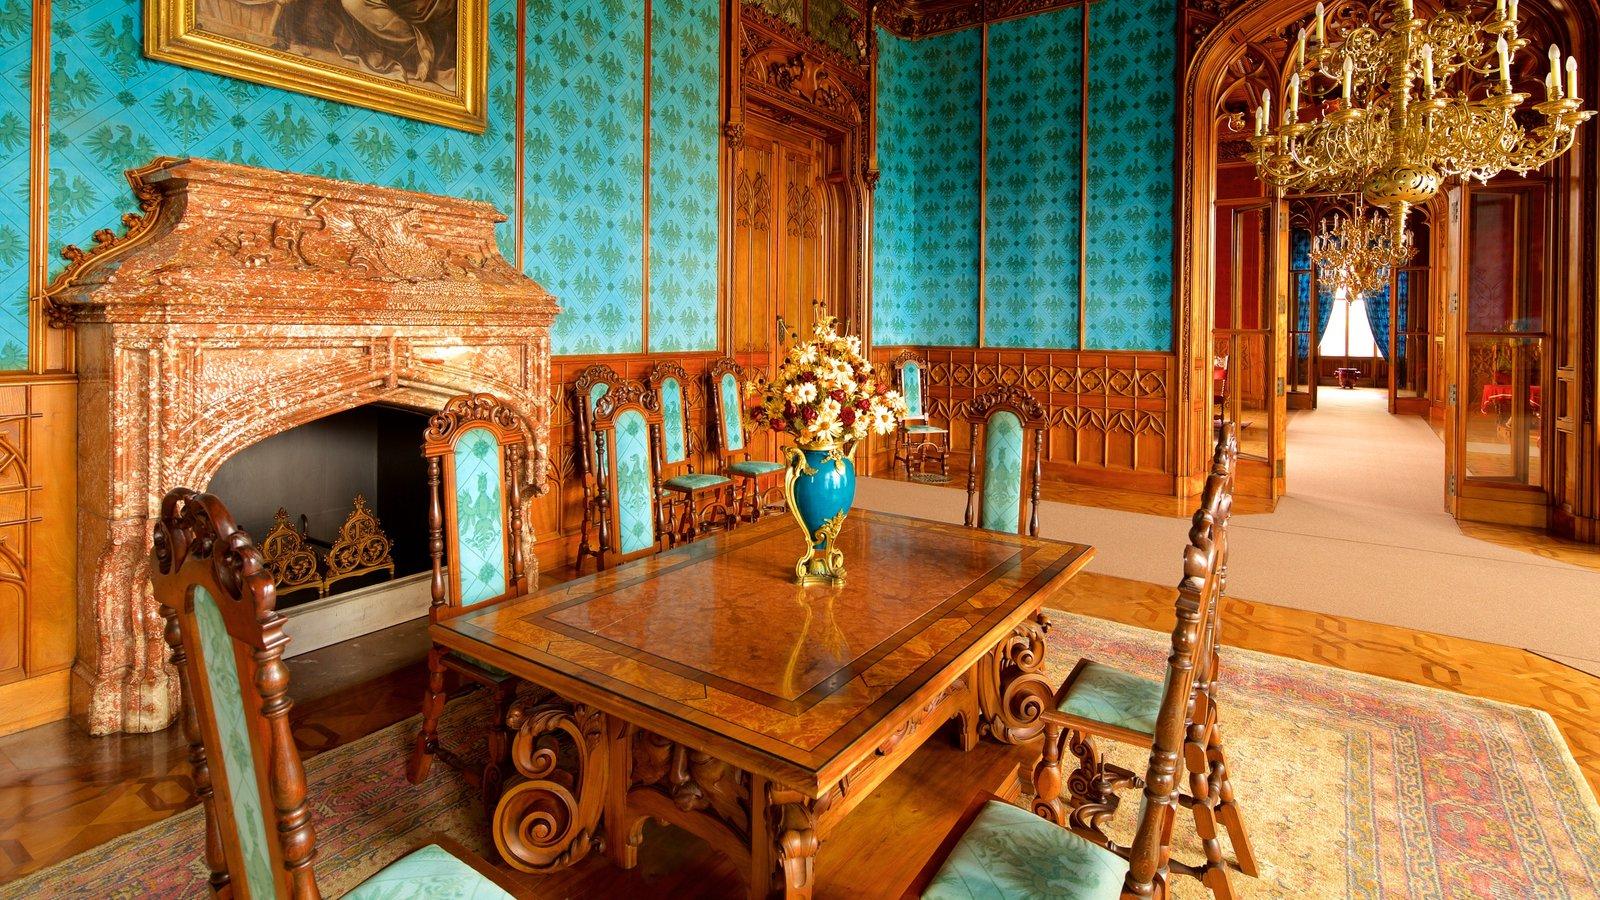 lednice castle pictures: view photos & images of lednice castle